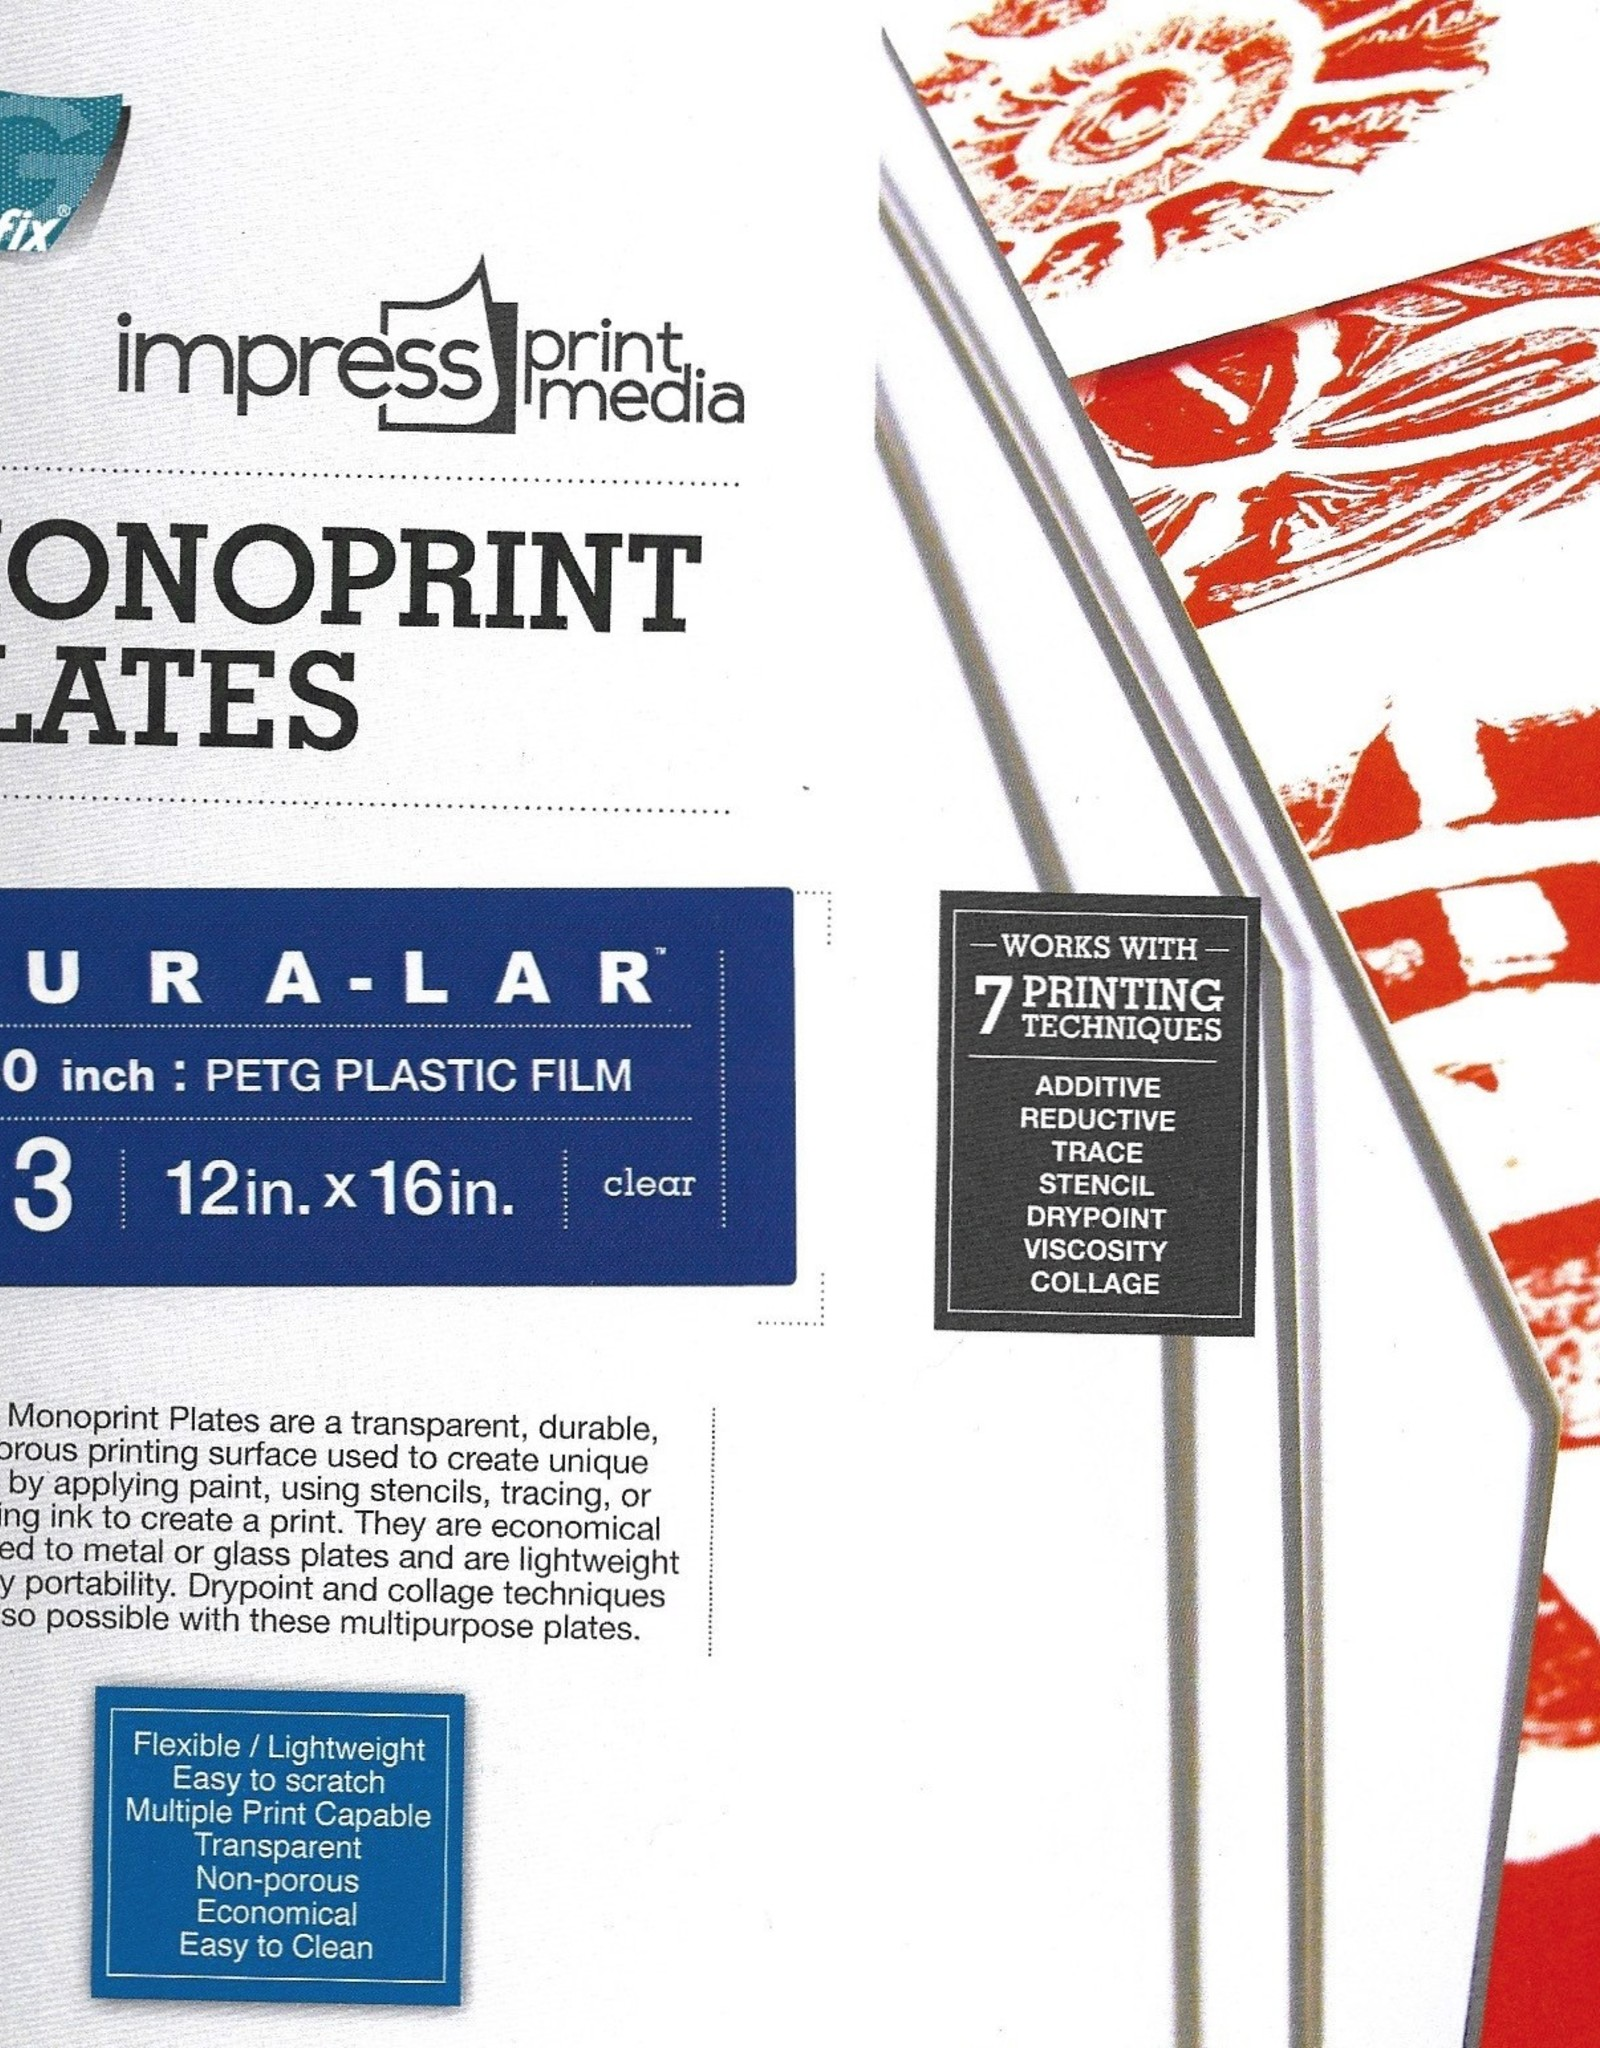 "Dura-Lar Monoprint Plate Packs, Clear .030 12"" x 18"", 3 pack"